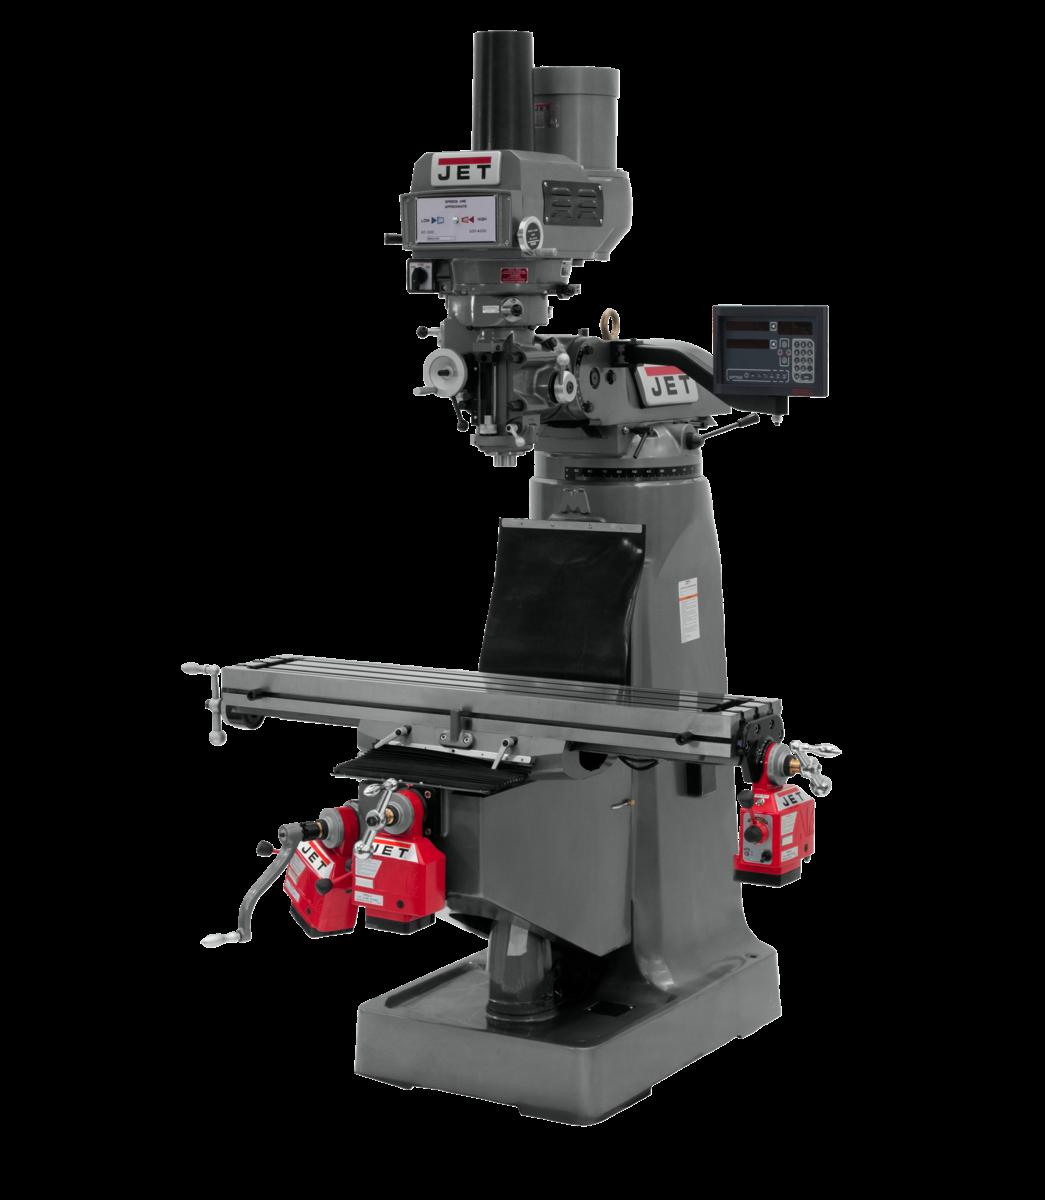 JTM-4VS-1 W/DP700 3-AX Q DRO X,YZ, D BAR